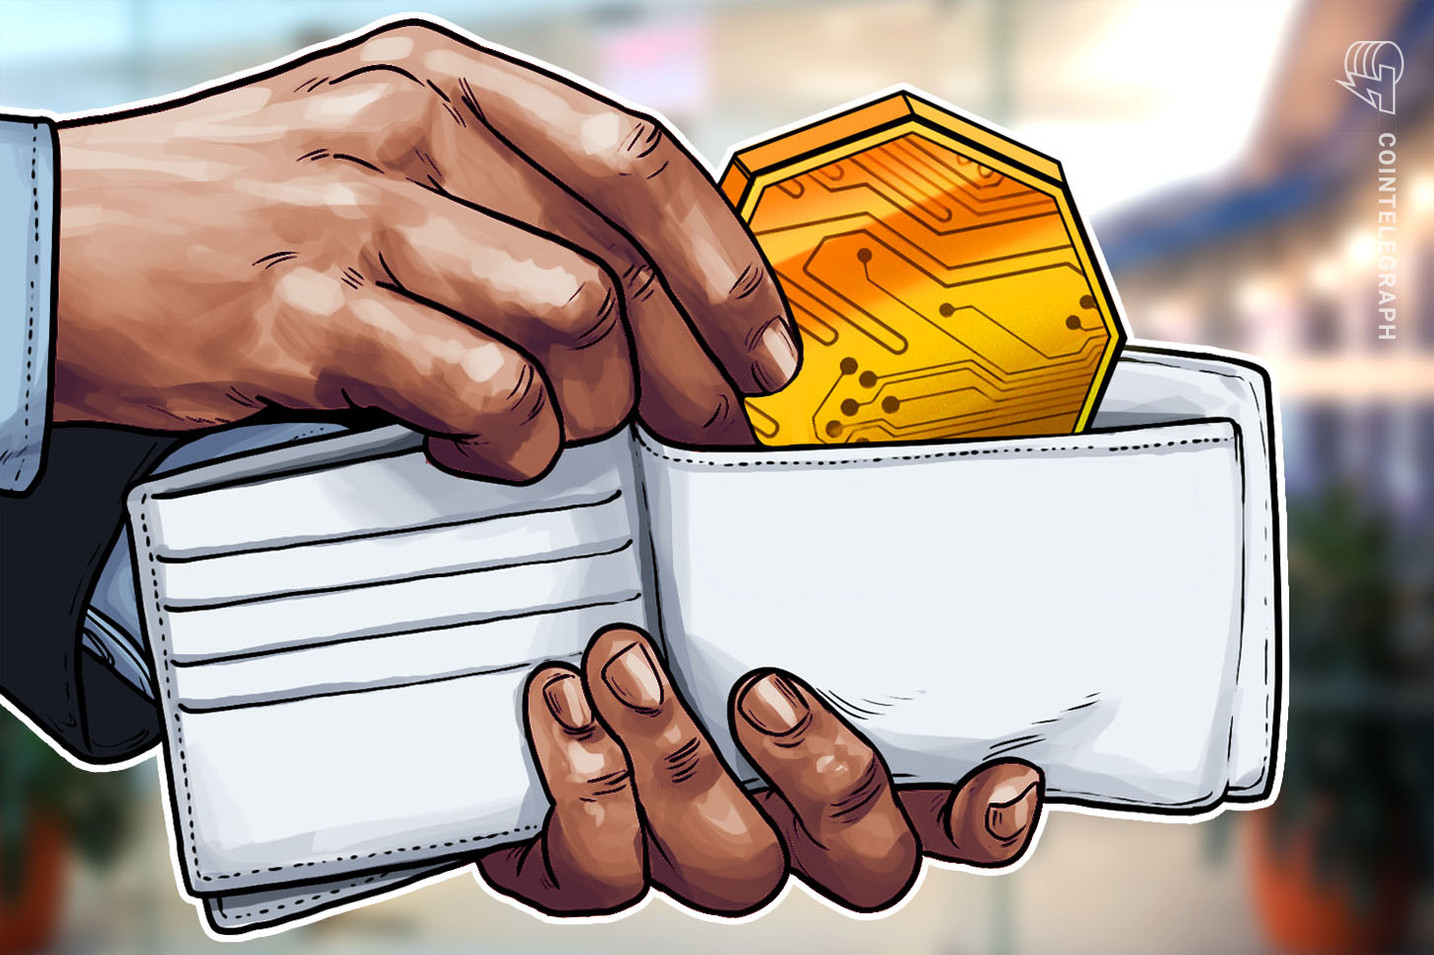 Dutch Bank ABN AMRO Abandons Wallie Custodial Bitcoin Wallet Citing Risk Concerns